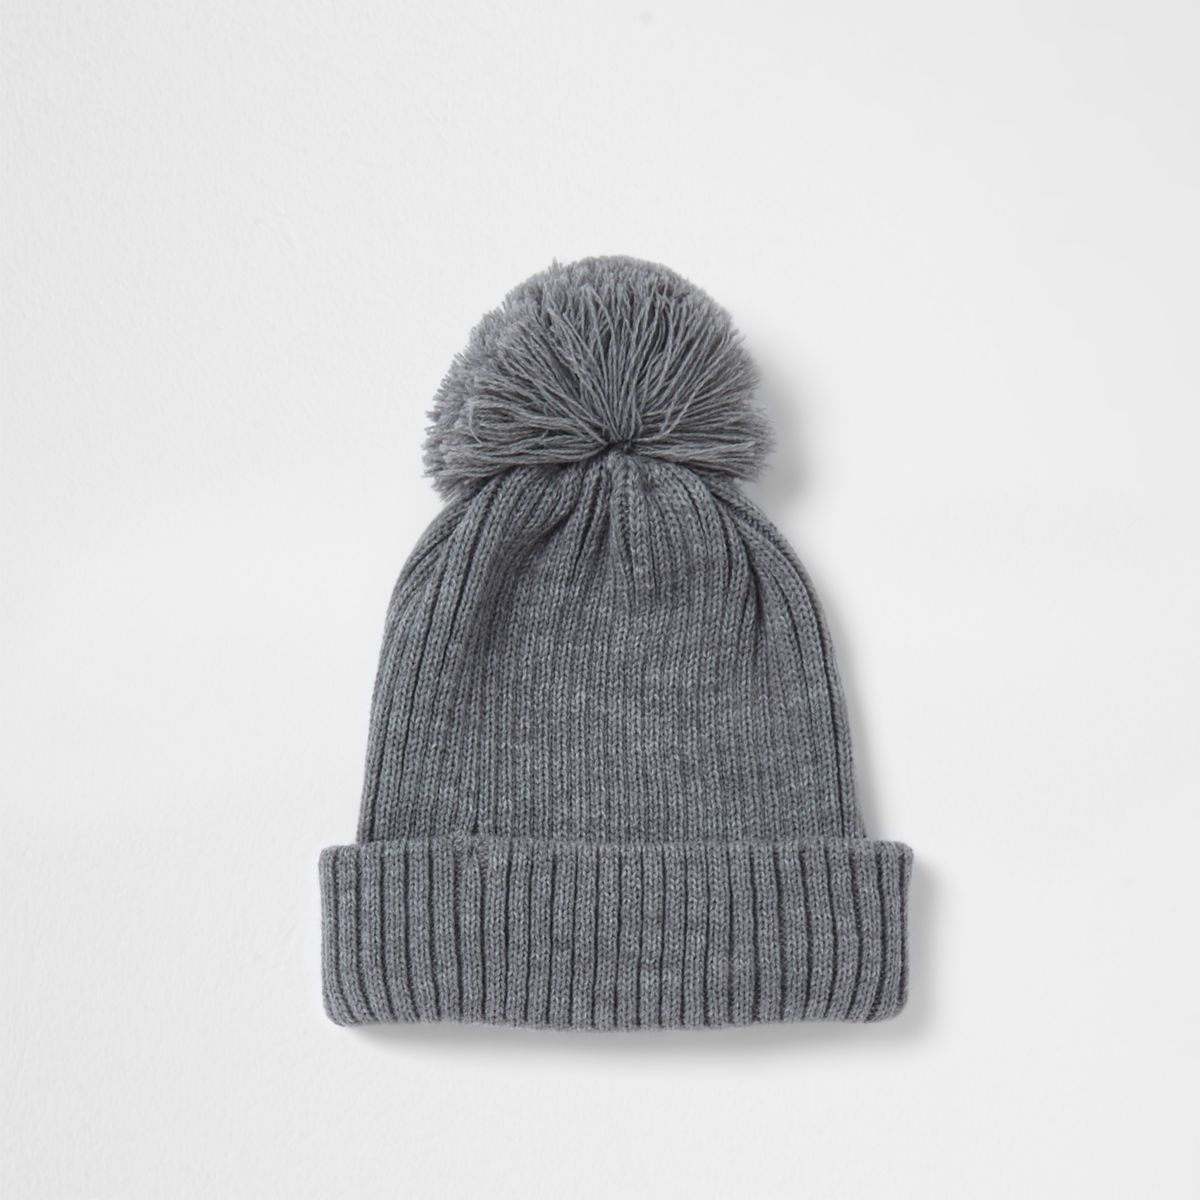 Grey rib knit bobble beanie hat